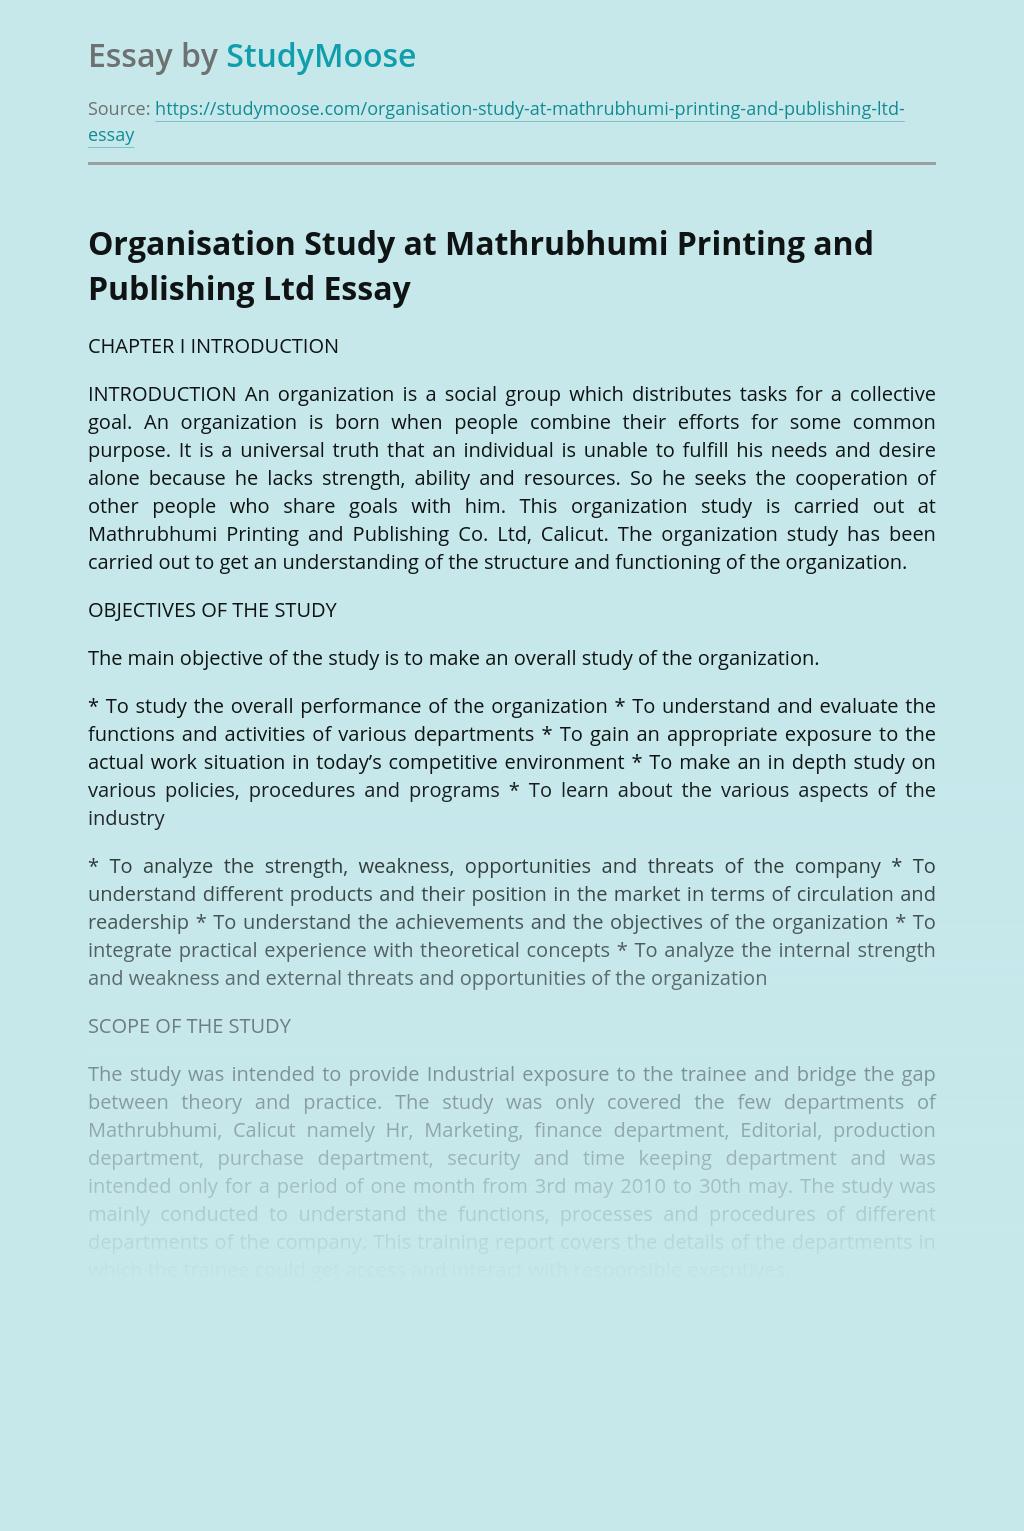 Organisation Study at Mathrubhumi Printing and Publishing Ltd